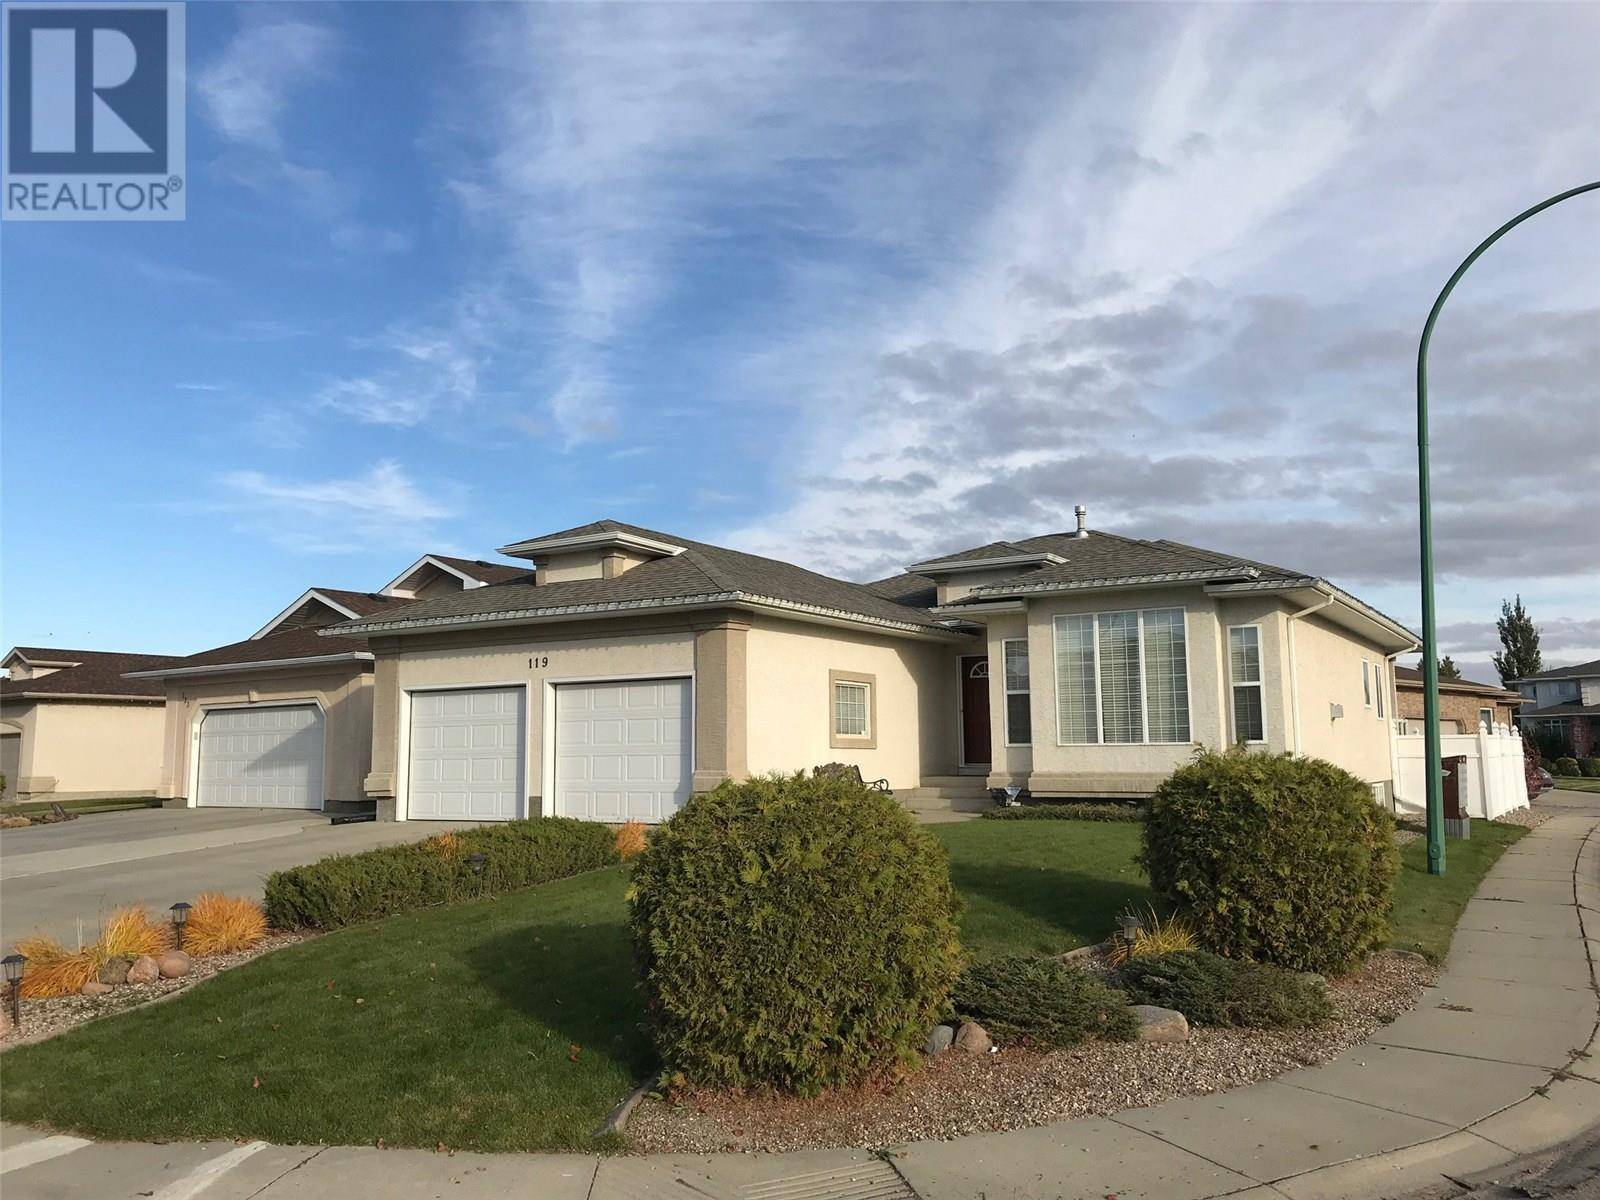 House for sale at 119 Beechmont Cres Saskatoon Saskatchewan - MLS: SK778589